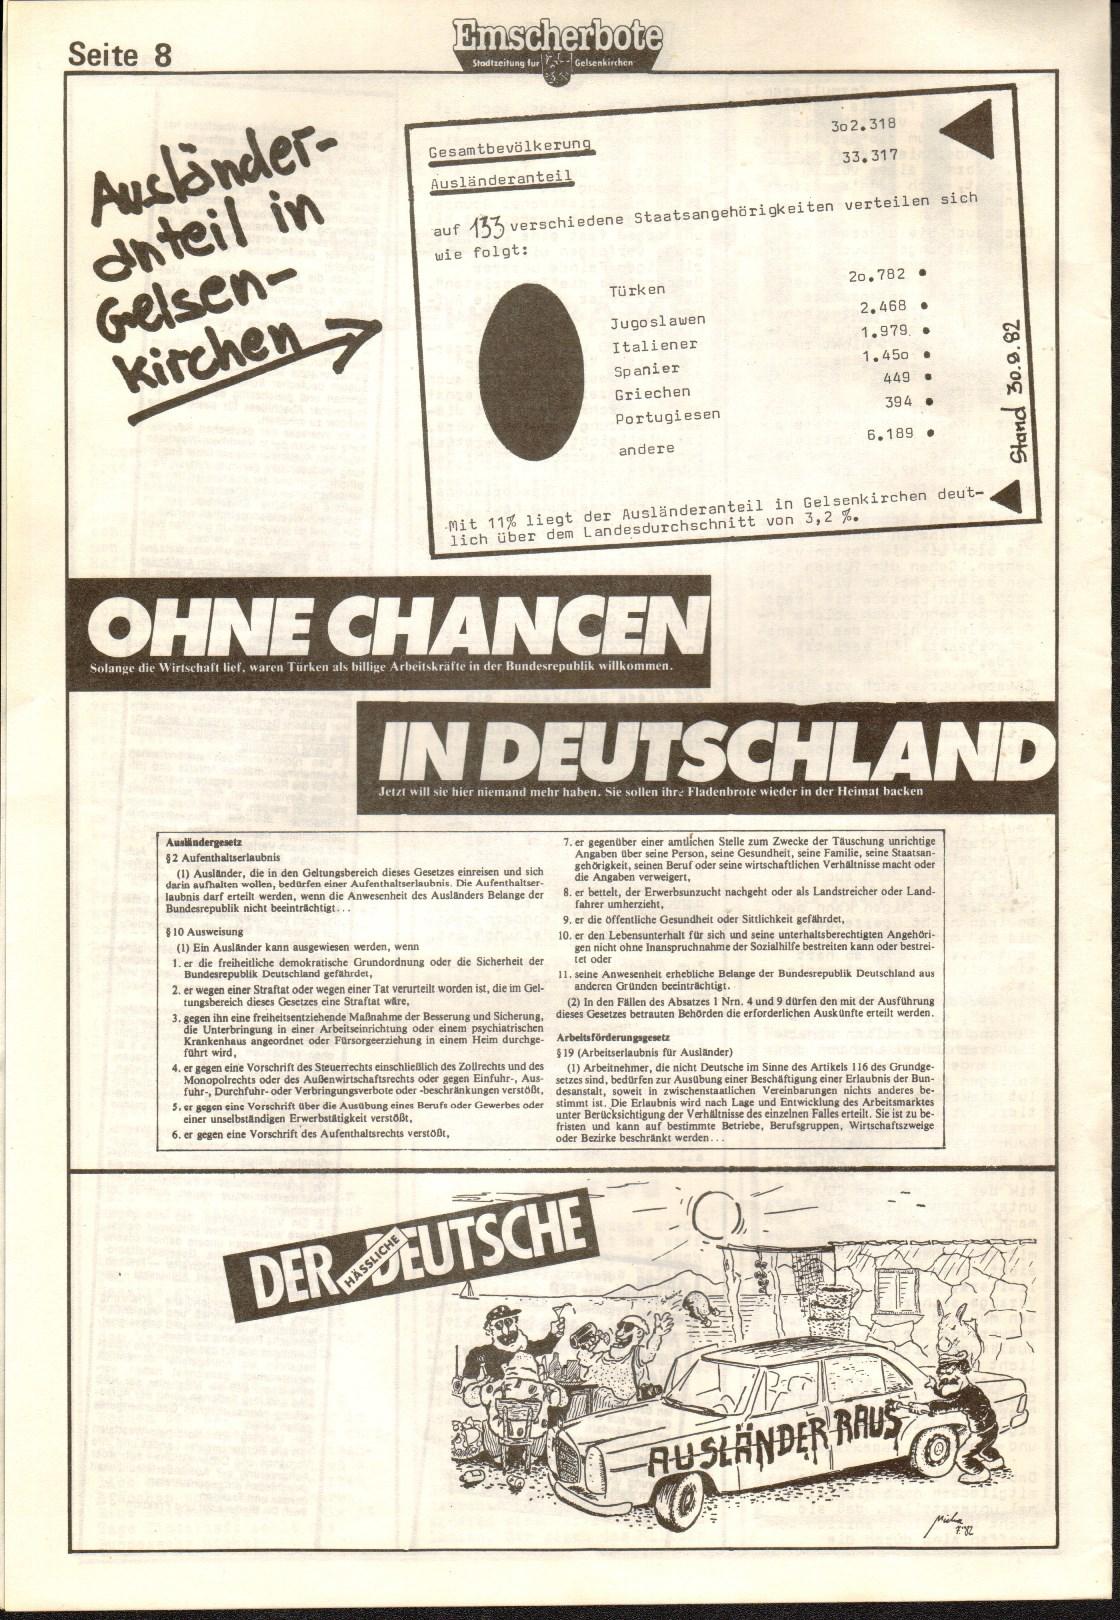 Gelsenkirchen_Emscherbote_1982_23_08